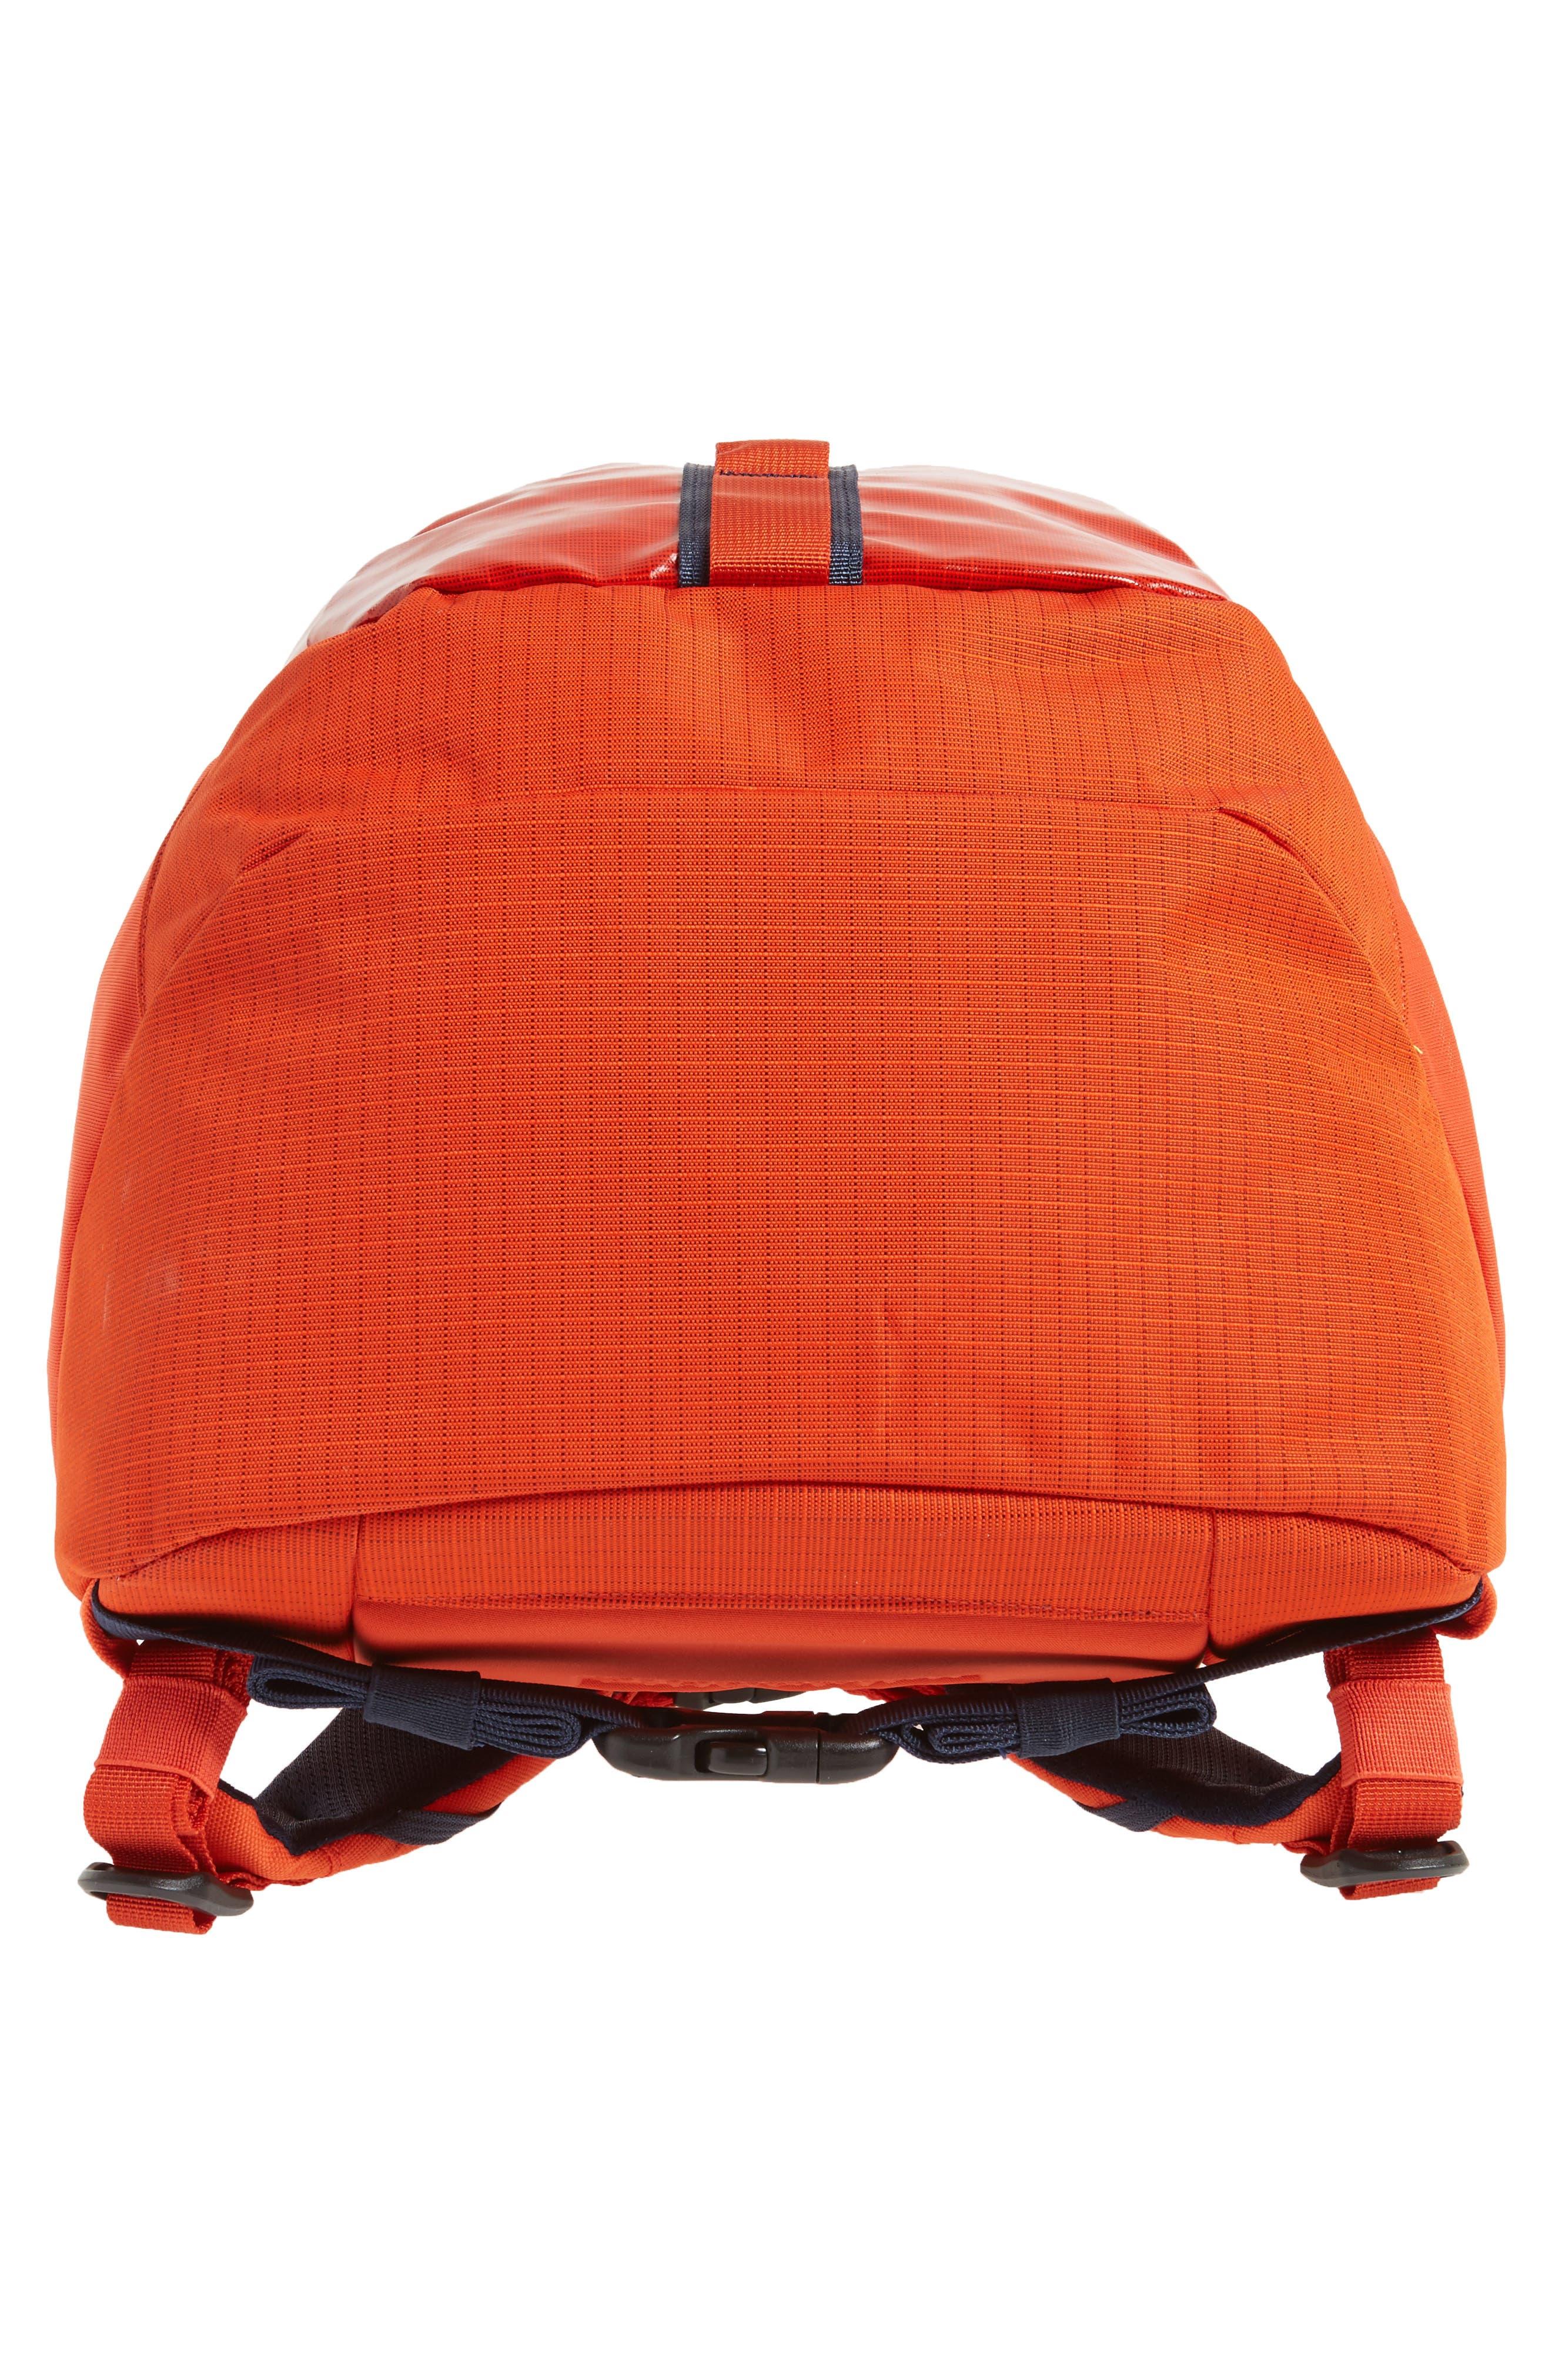 Black Hole 30-Liter Backpack,                             Alternate thumbnail 6, color,                             Paintbrush Red